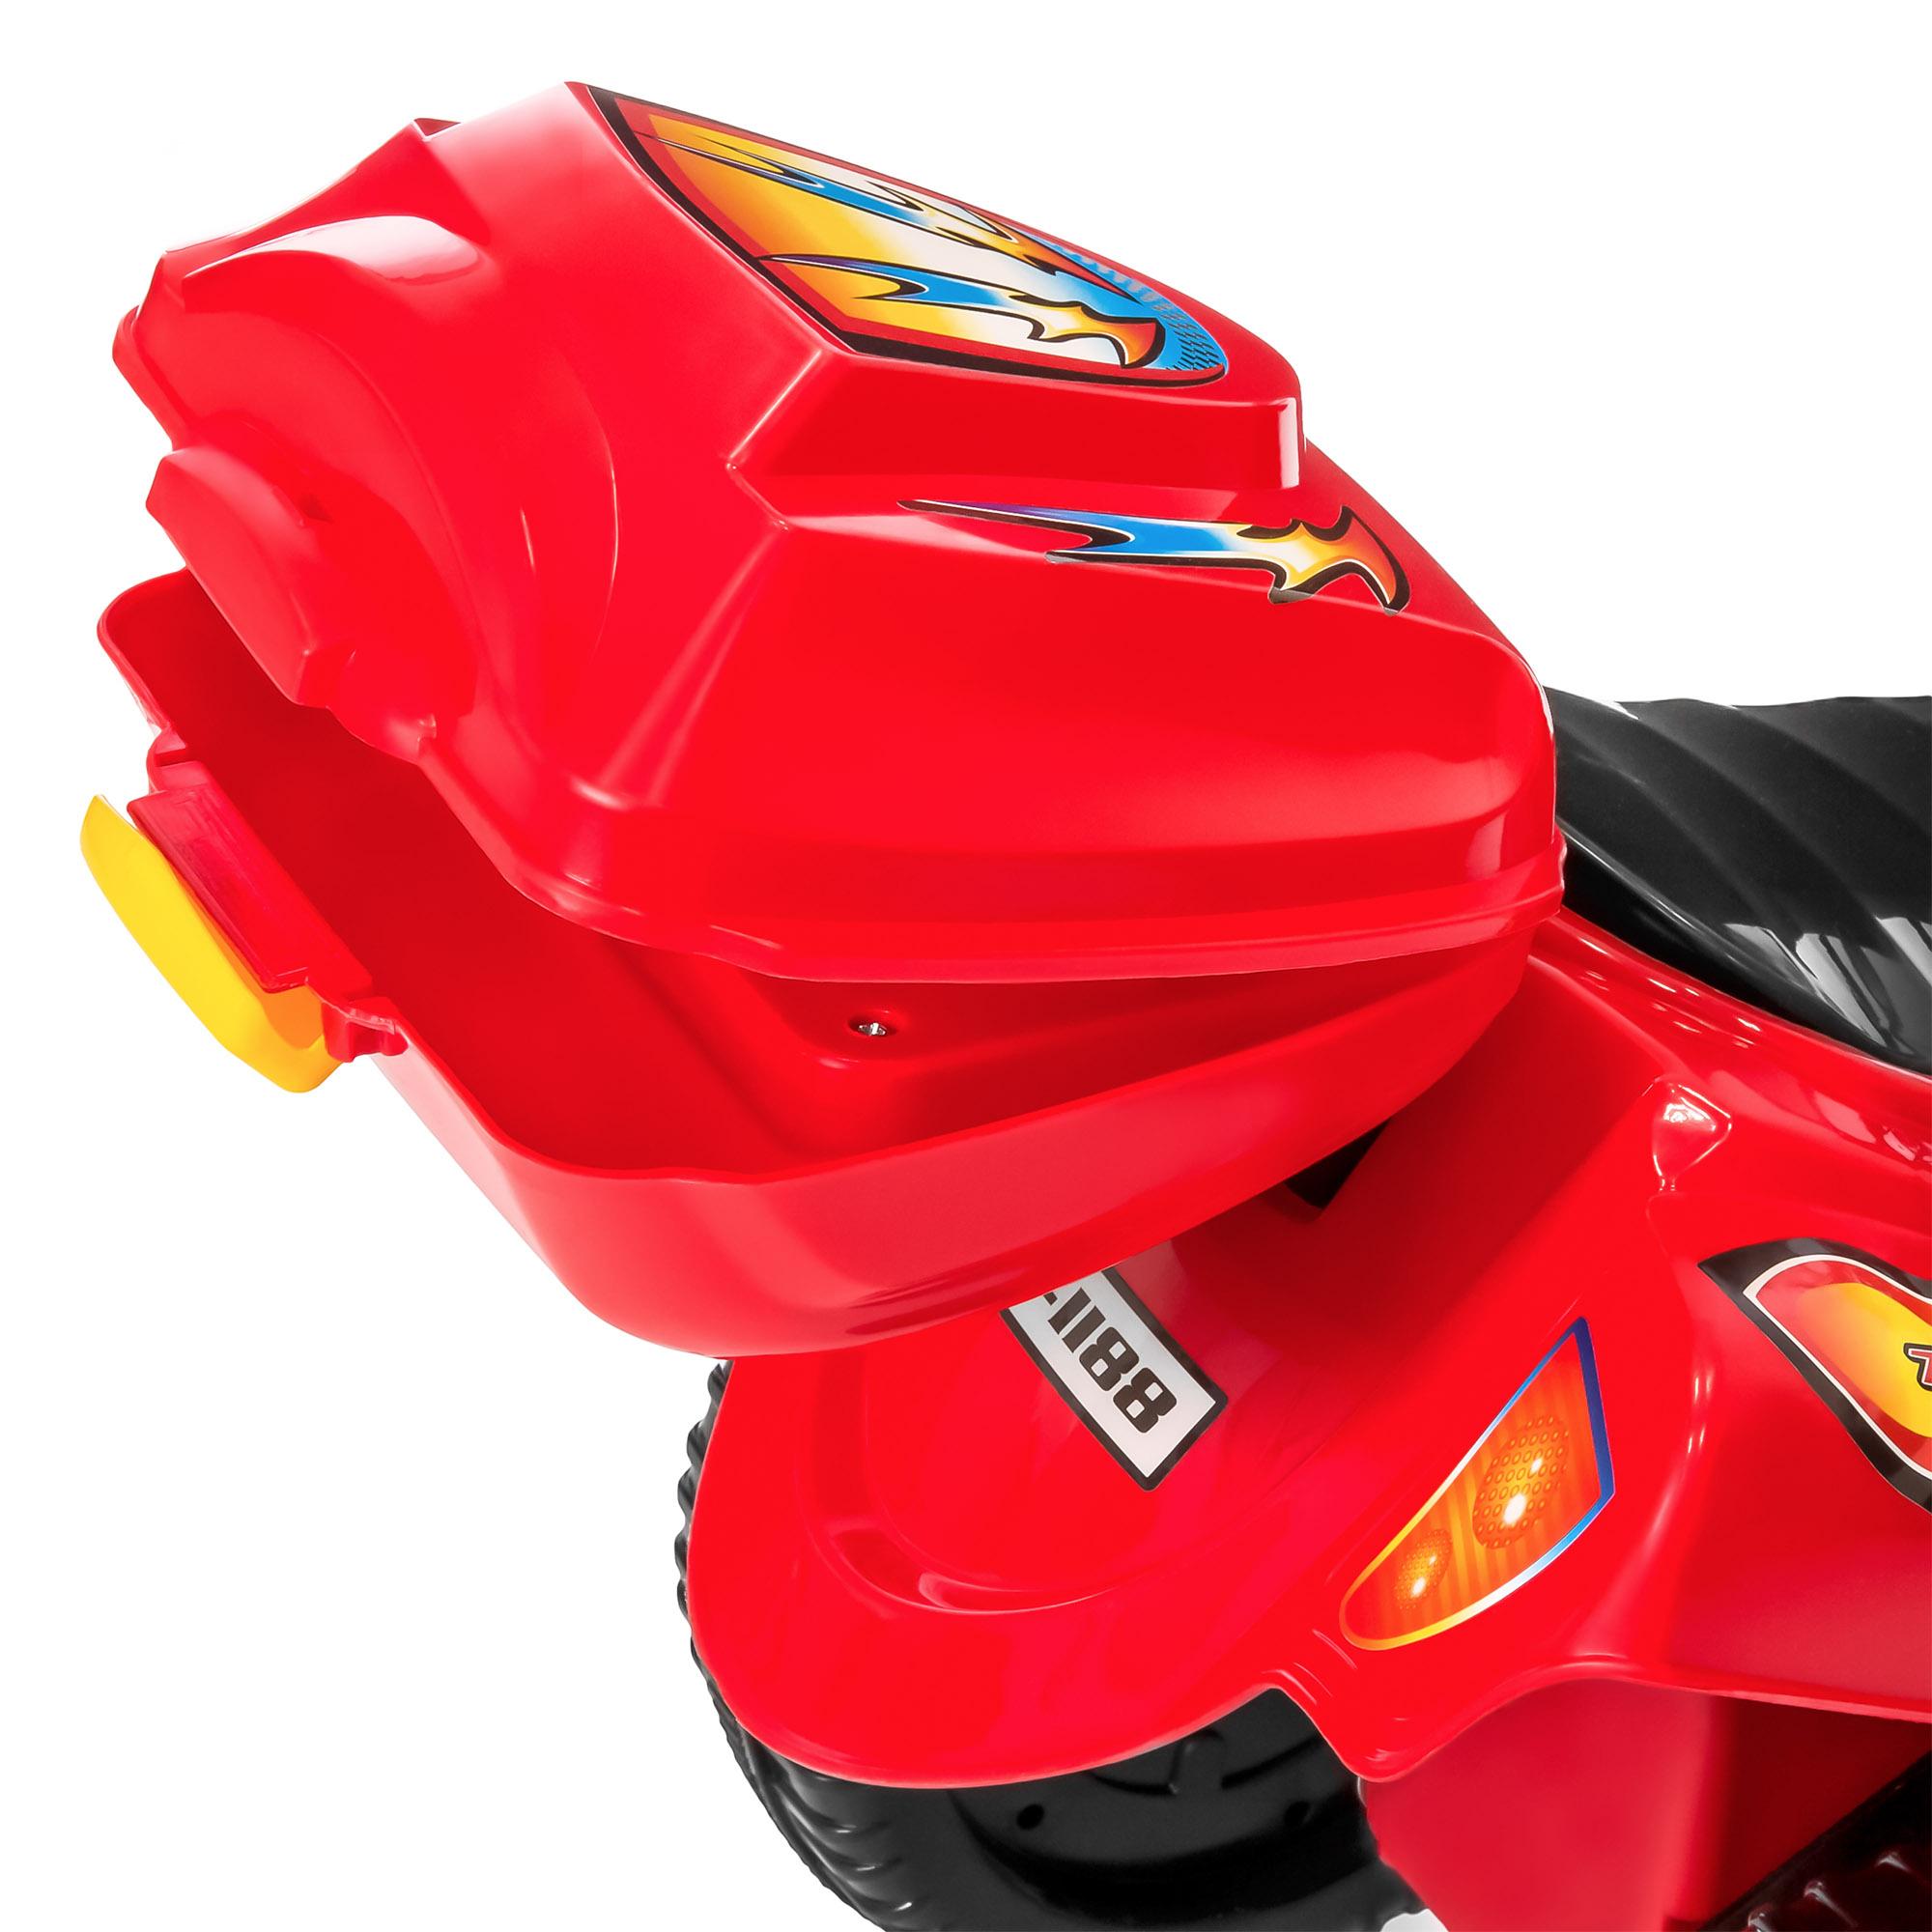 BCP-6V-Kids-3-Wheel-Motorcycle-Ride-On-Toy-w-LED-Lights-Music-Storage thumbnail 33